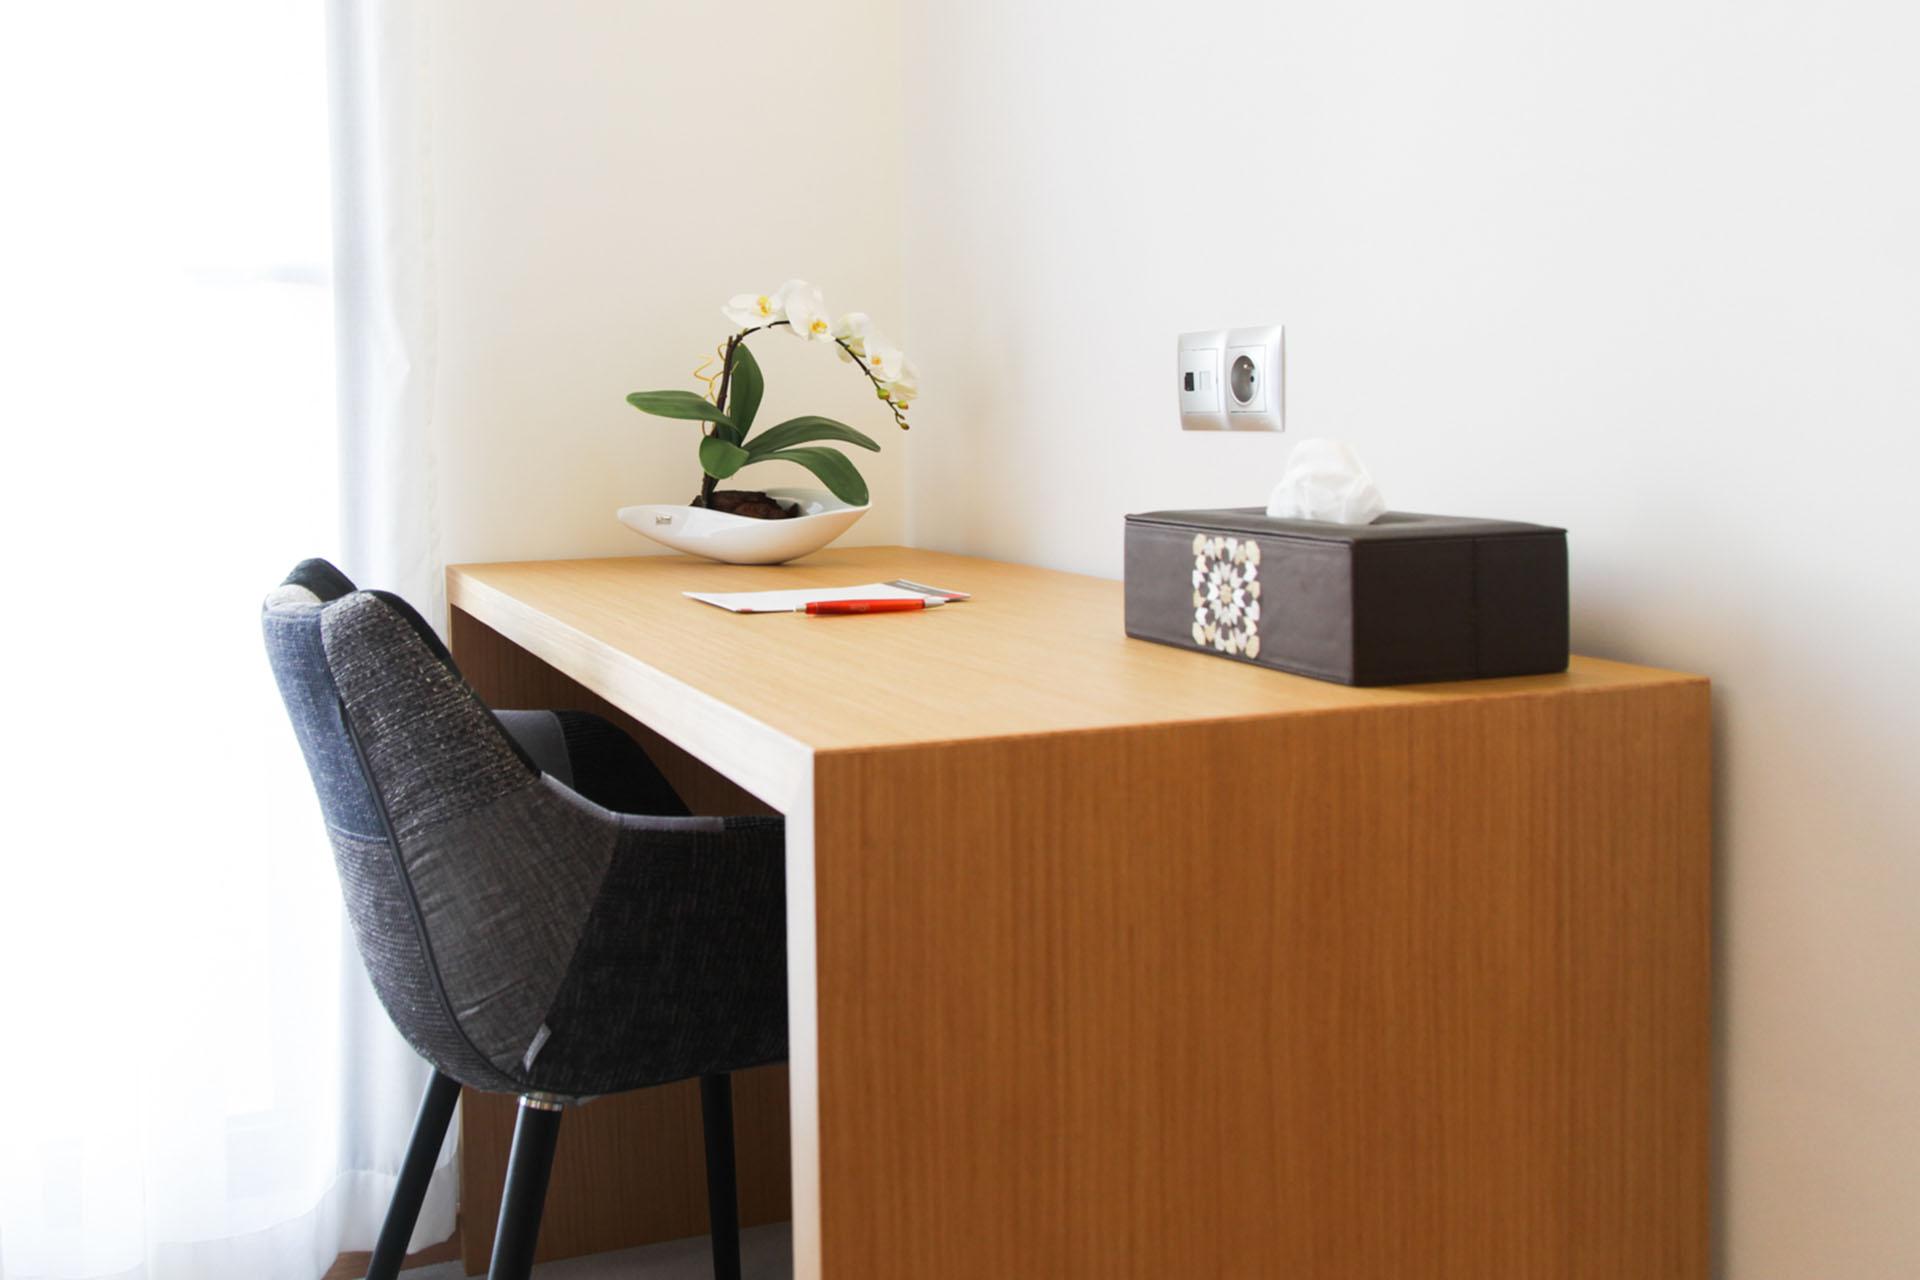 http://smartshotel.com/wp-content/uploads/2016/04/Suite-Working-Desk.jpg